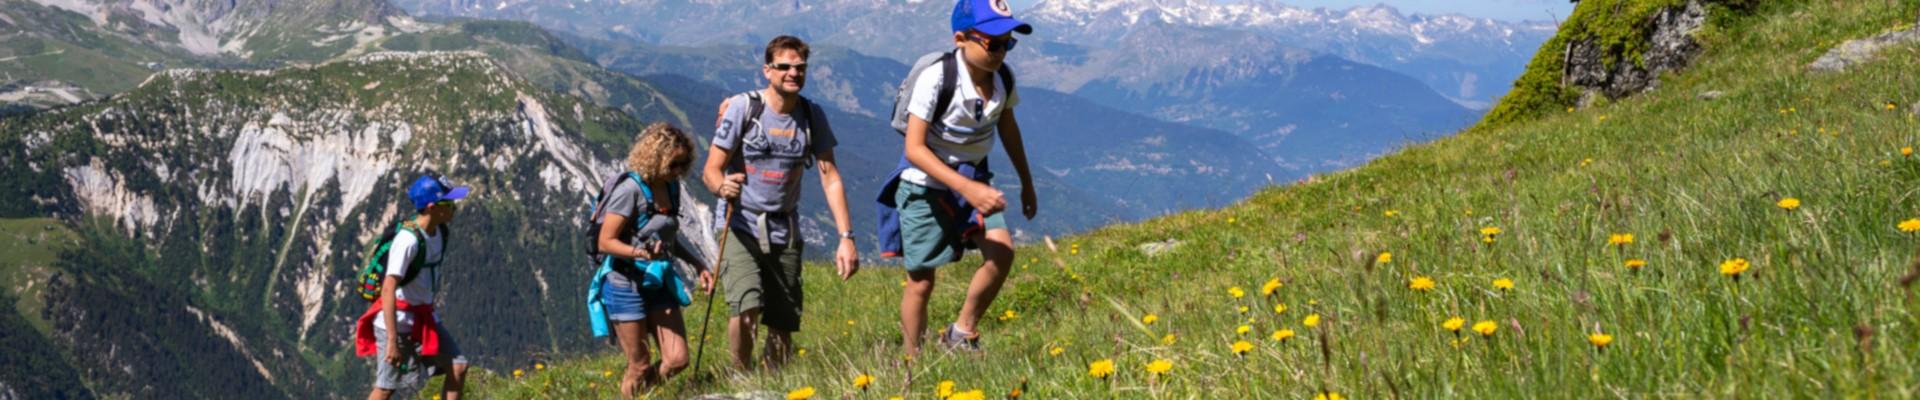 Randonnées, Balades Vallée de Bozel